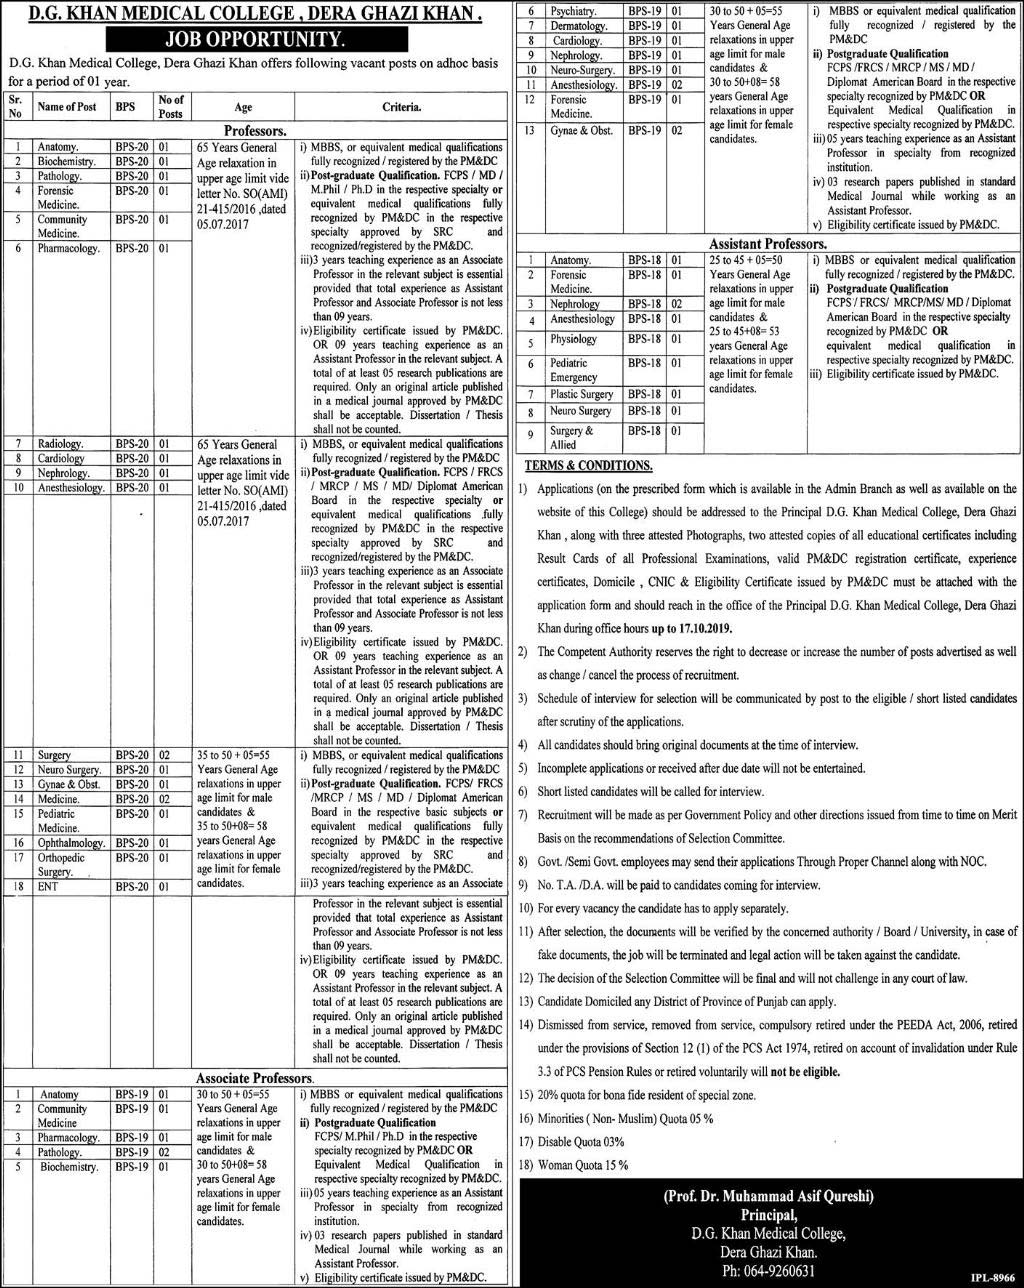 Jobs in DG Khan Medical College October 2019